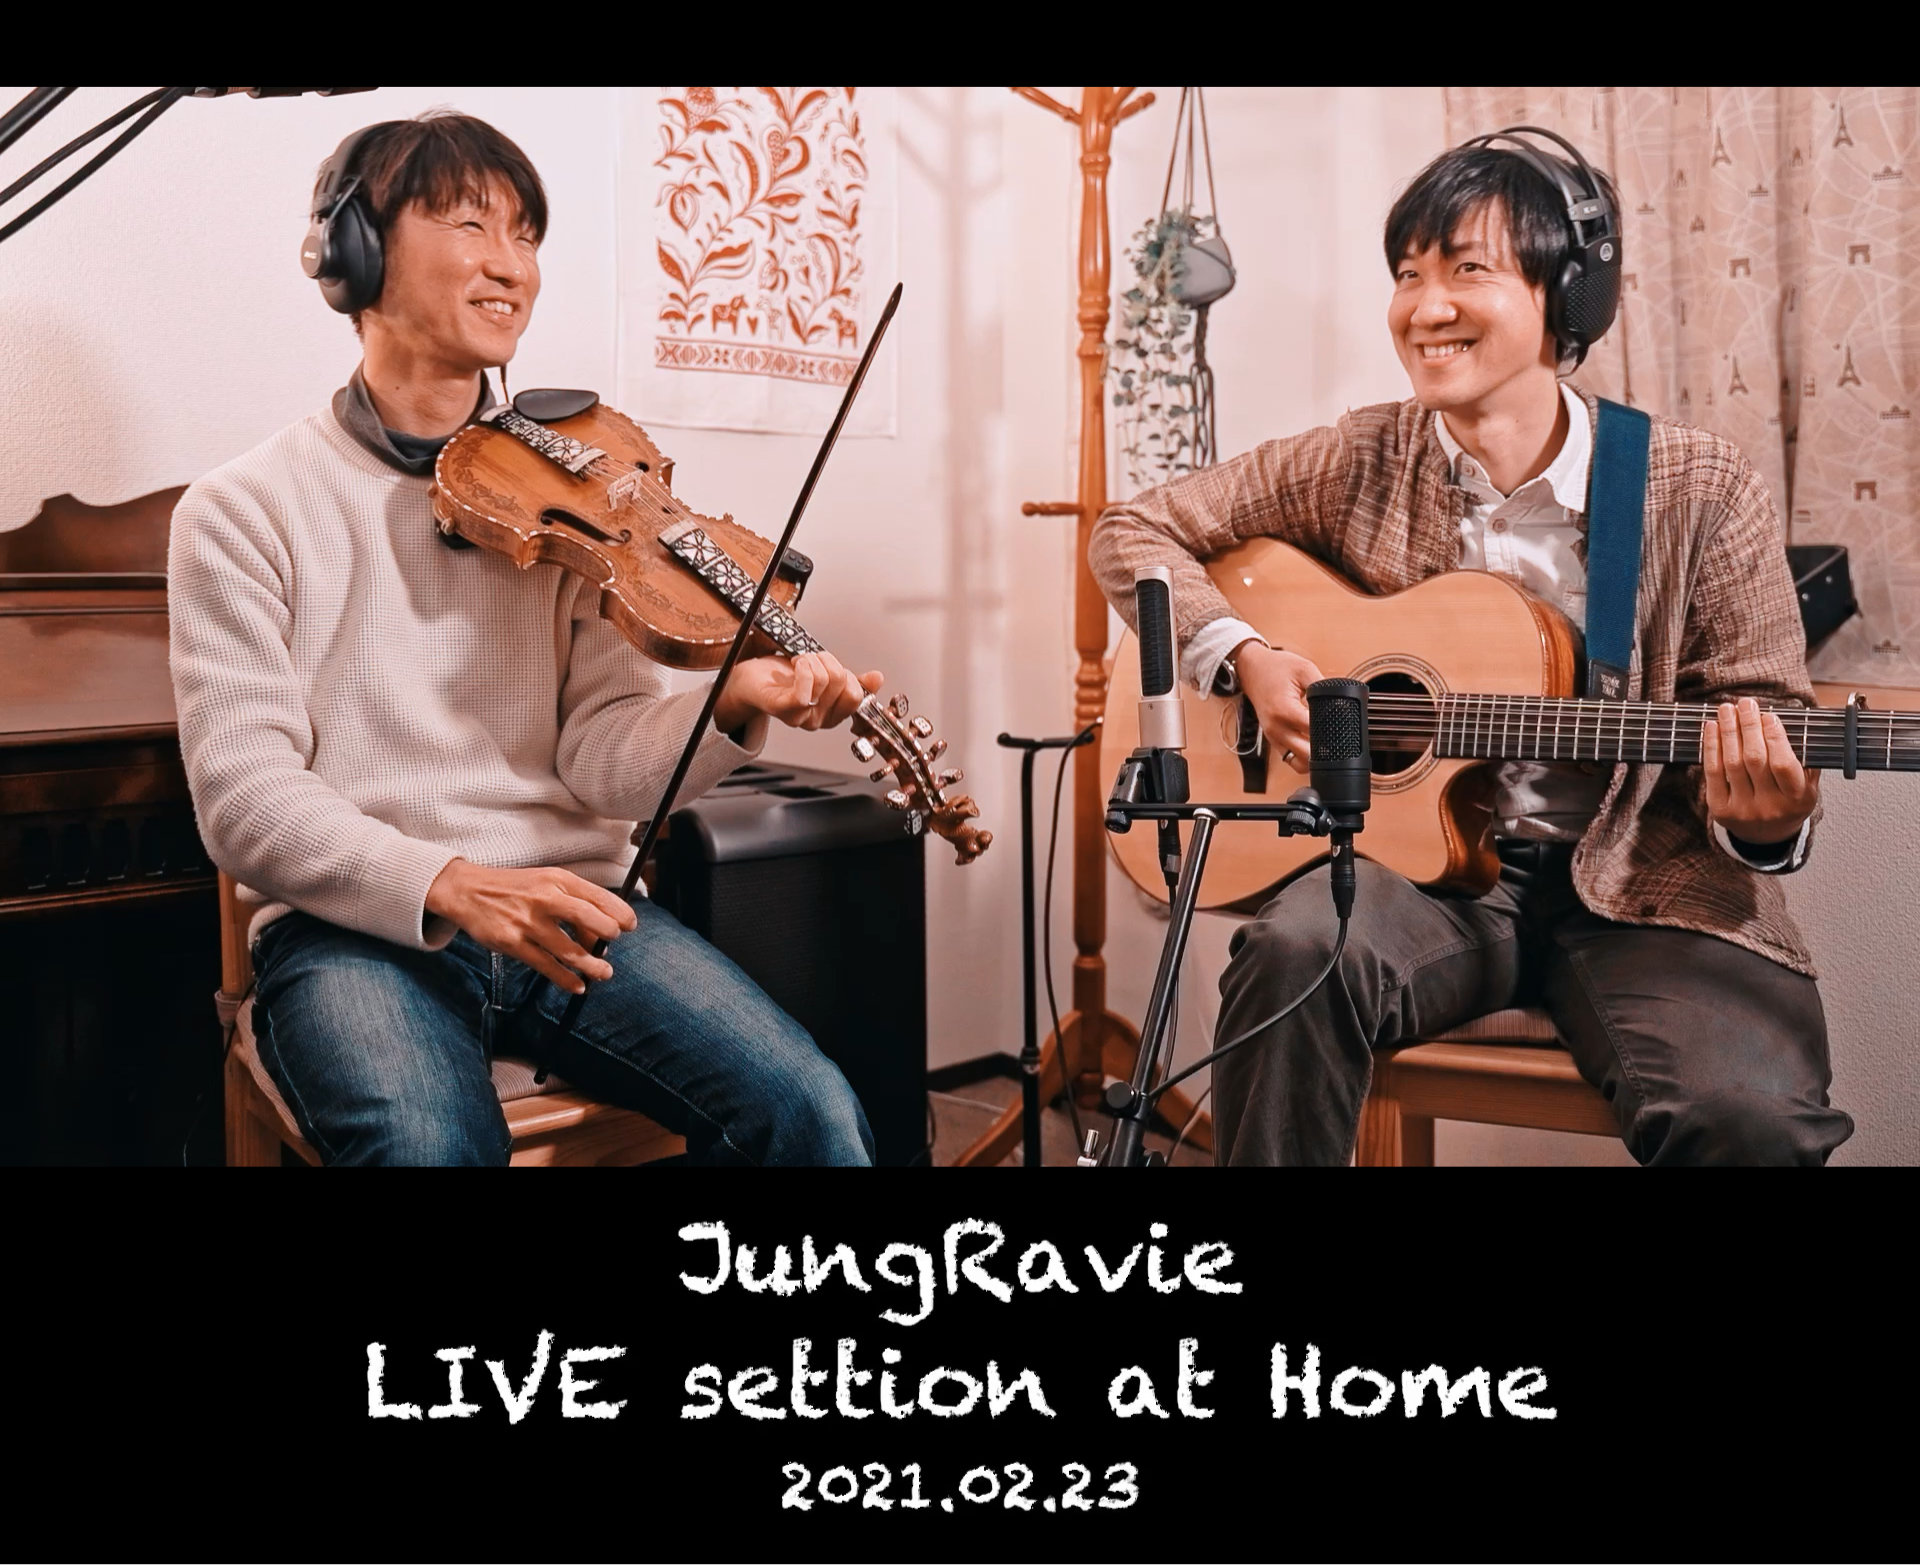 JungRavie official website